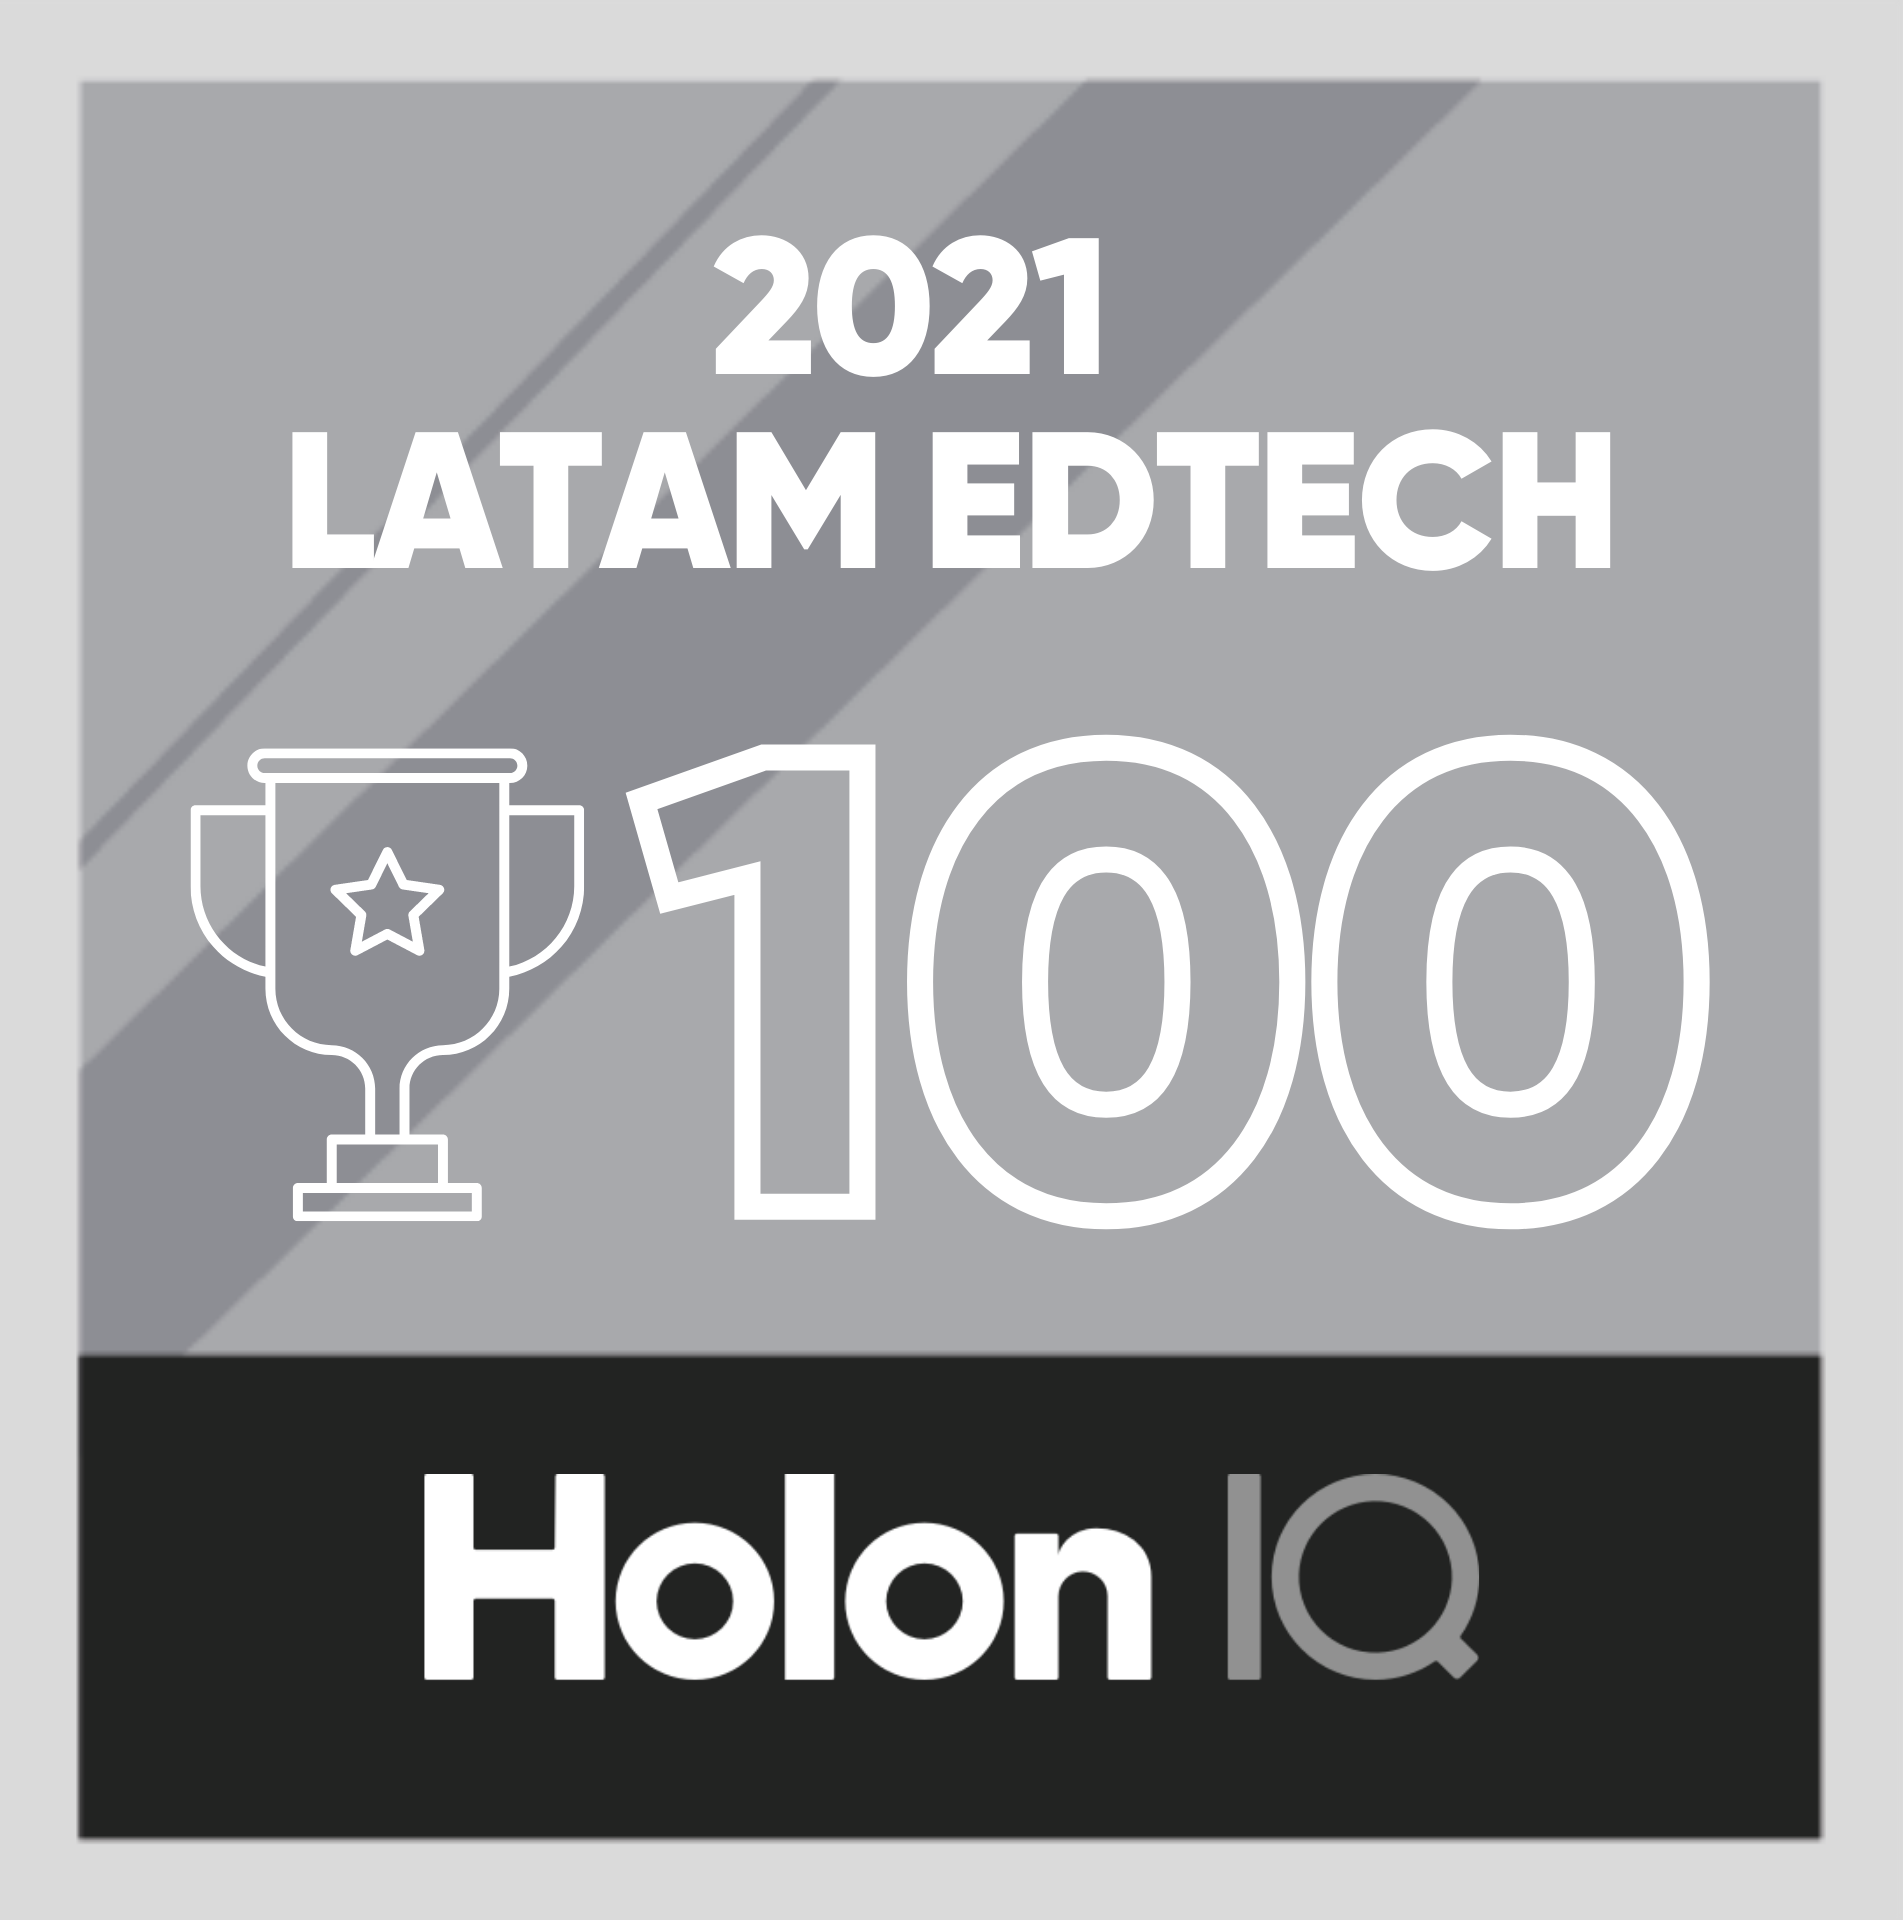 HolonIQ 2021 LATAM EdTech 100